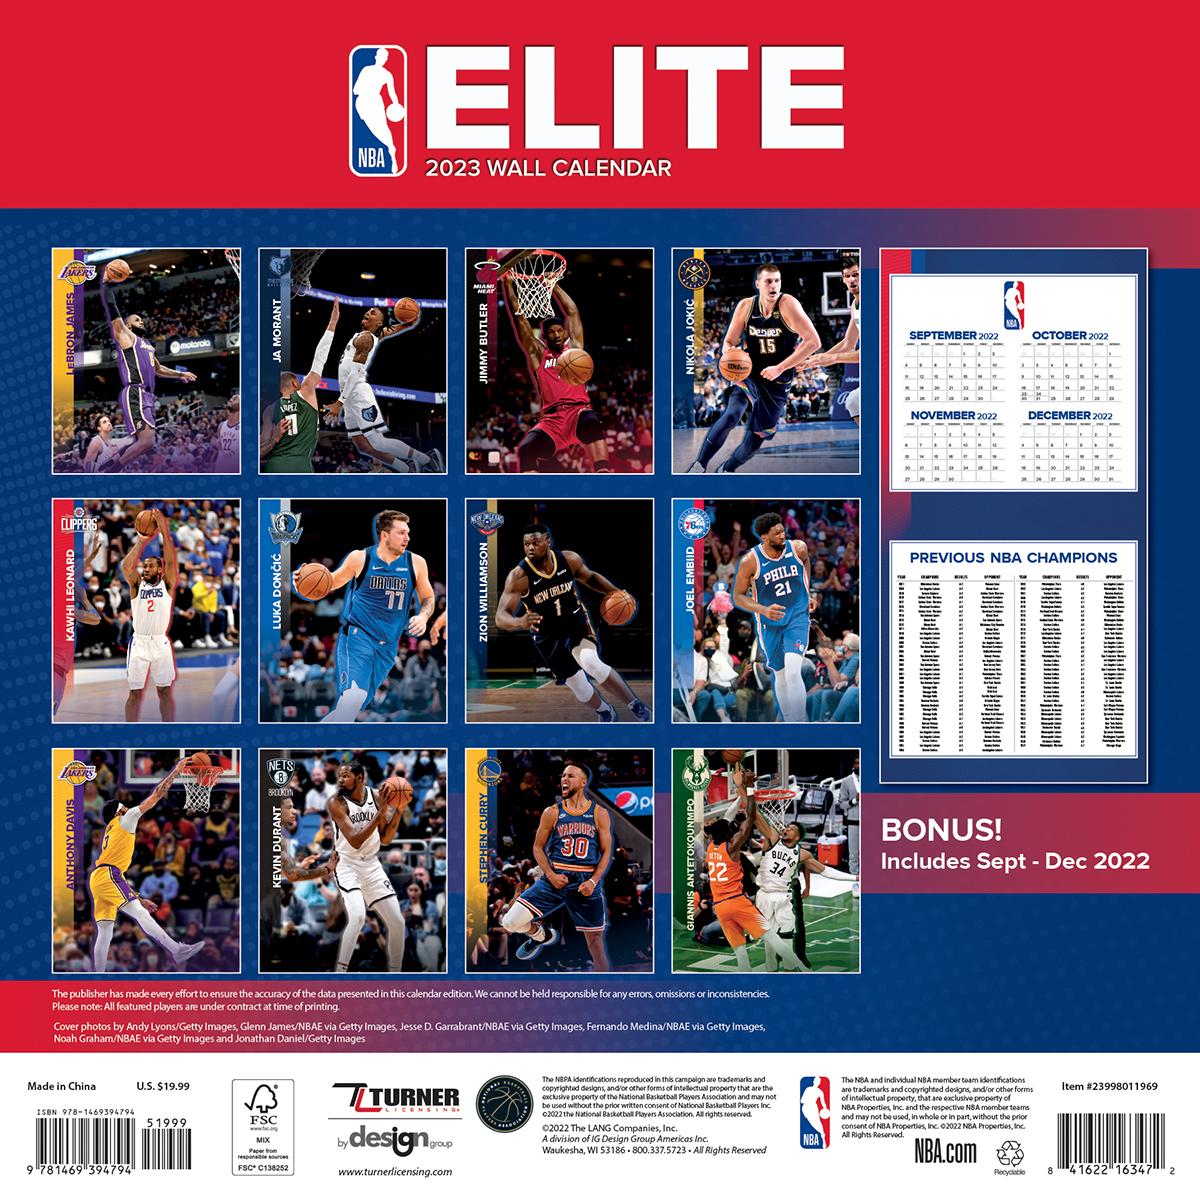 nba kalender